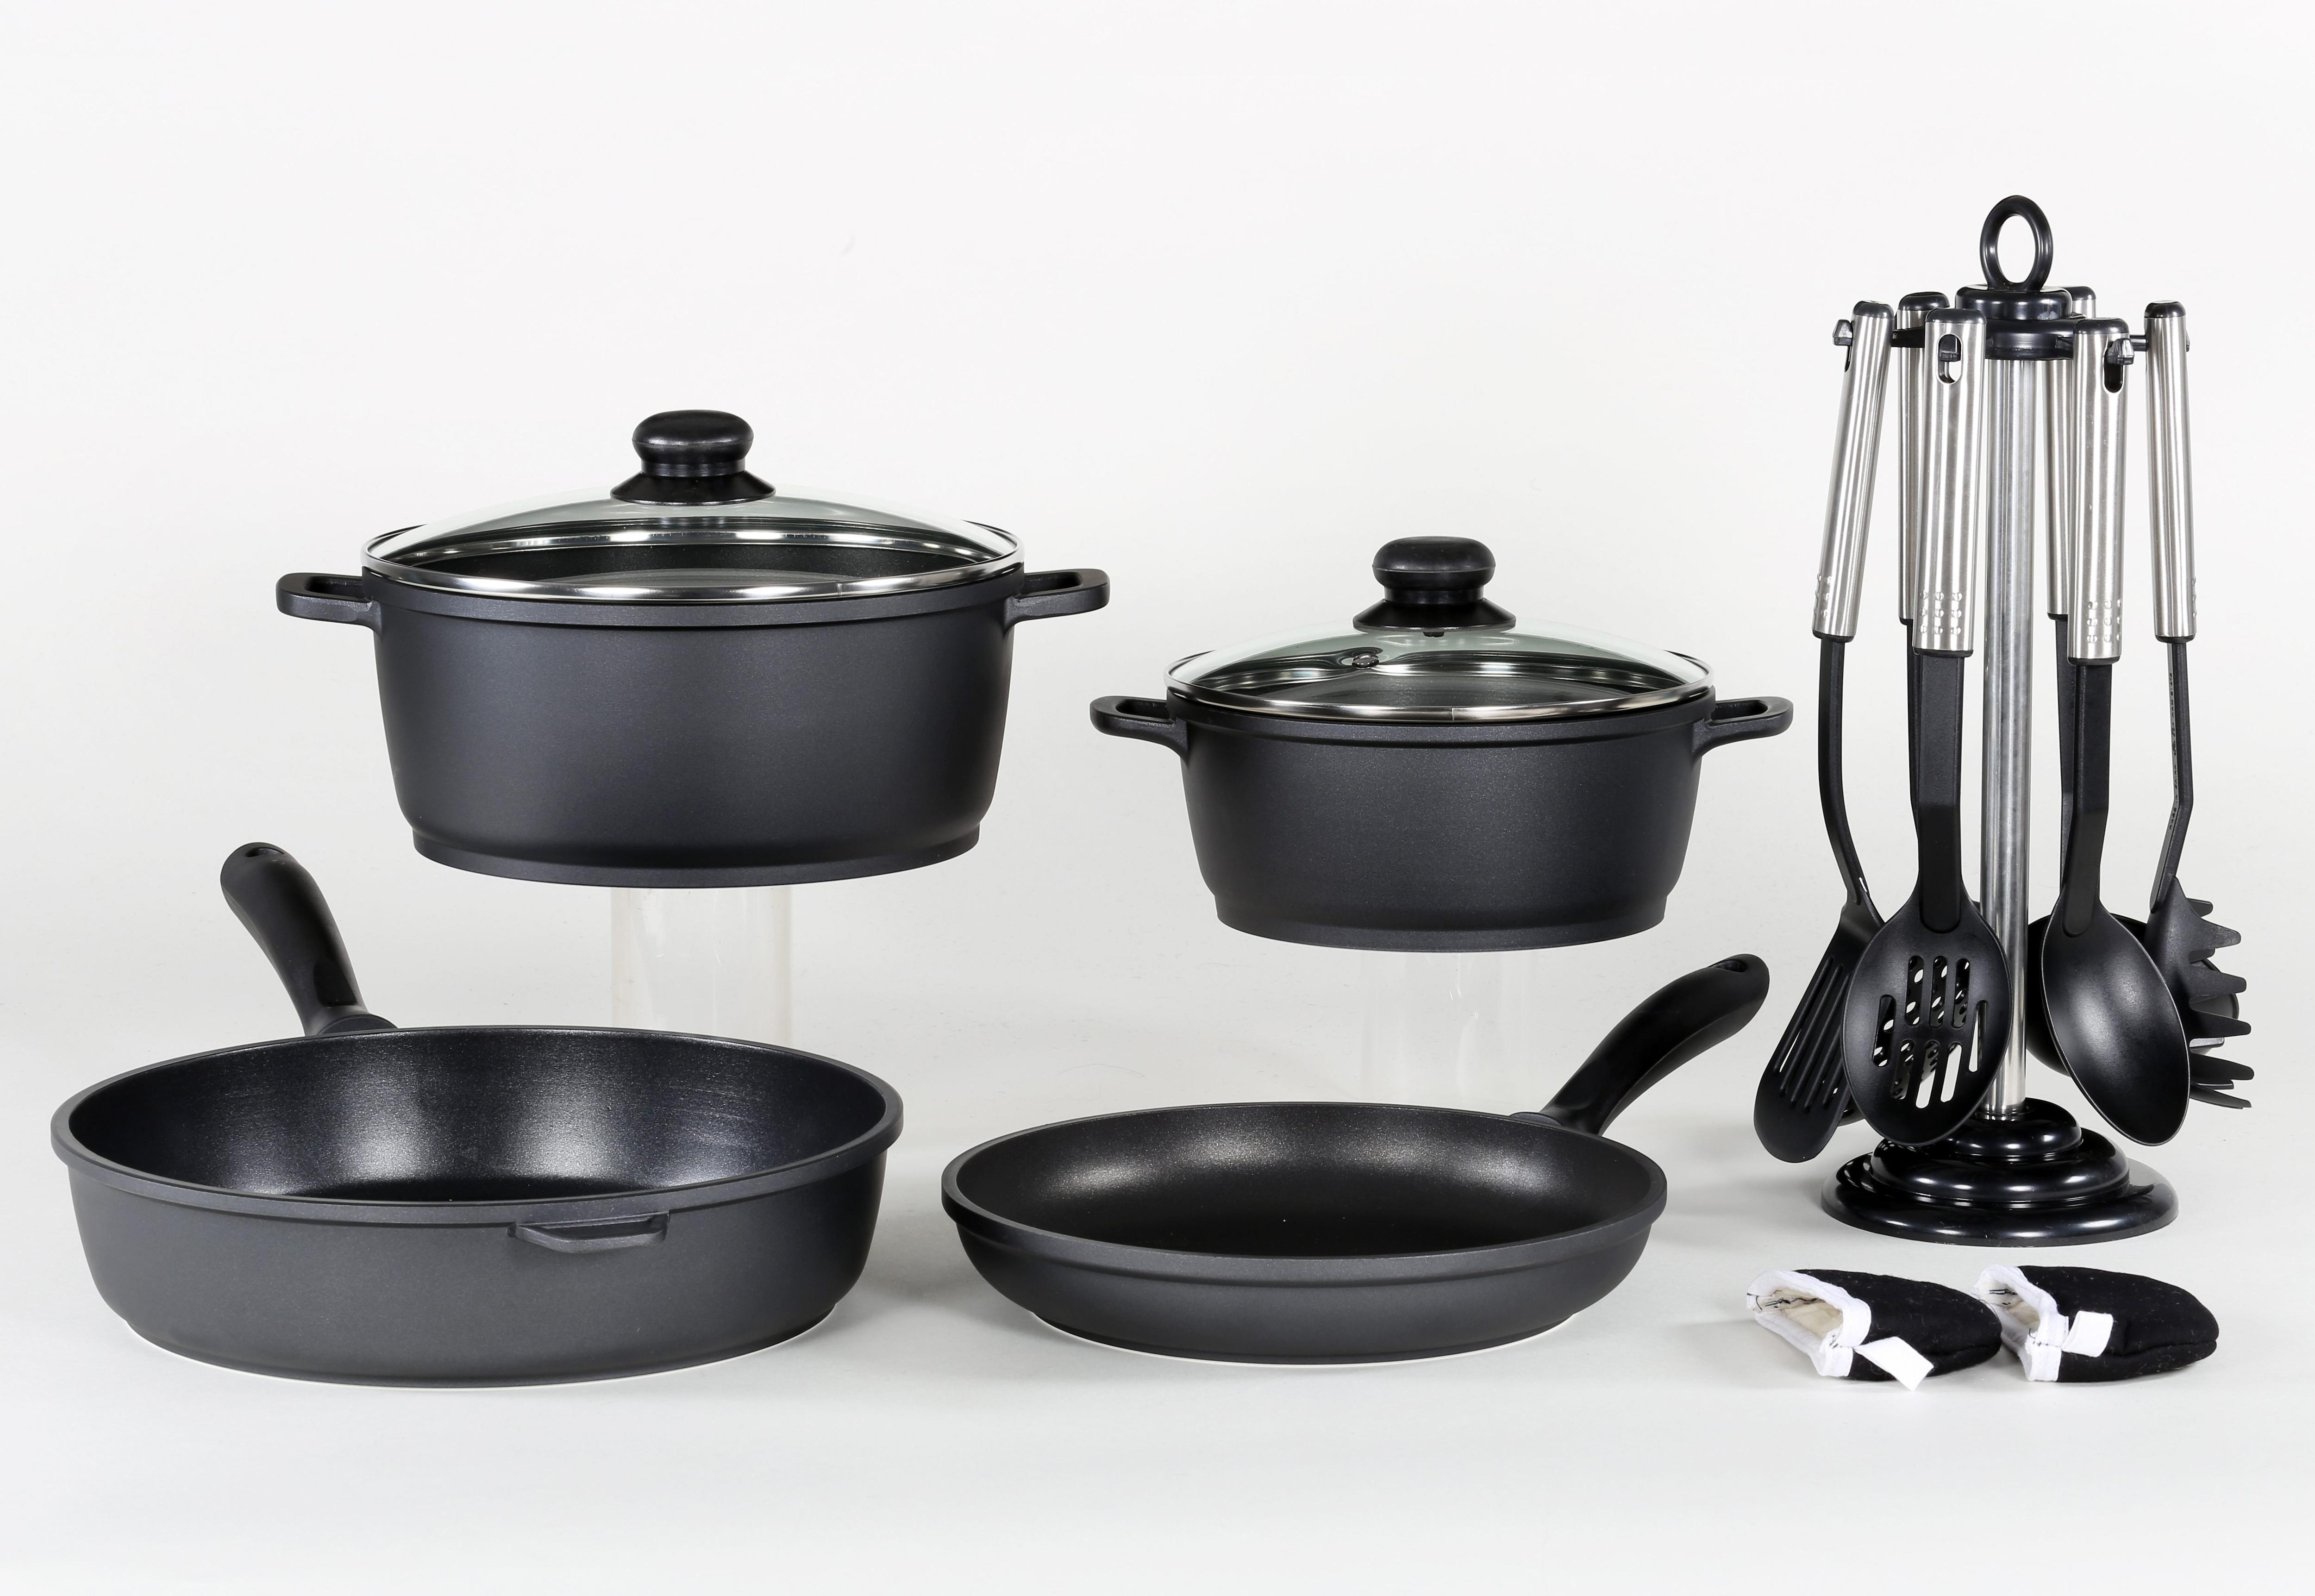 Krüger Pfannen-Set, Aluminiumguss, (Set, 13 tlg.) schwarz Topfsets Töpfe Haushaltswaren Pfannen-Set